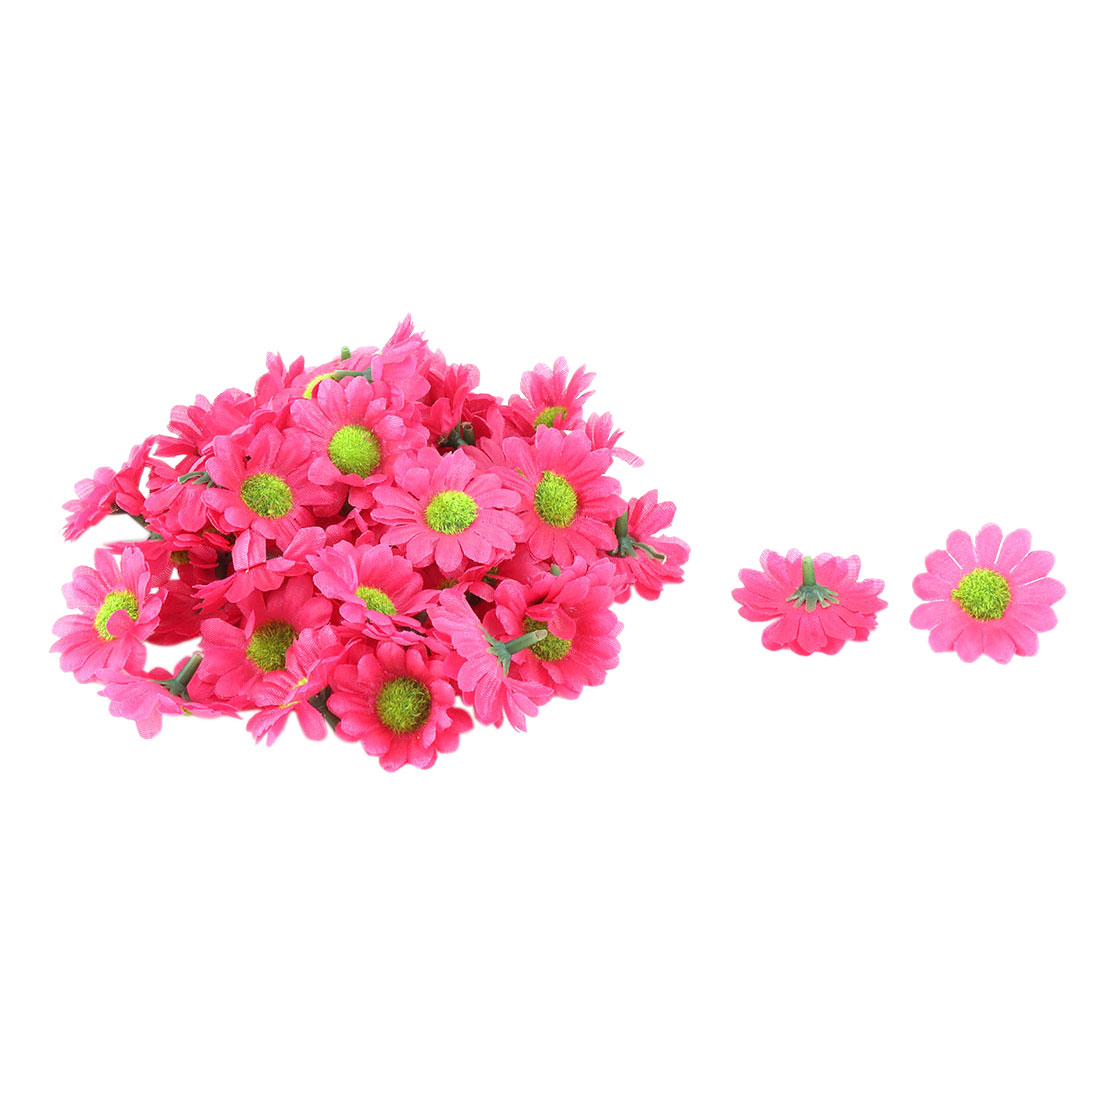 Bride Wedding Fabric Artificial Flower Head Headband Garland Decor Fuchsia  50pcs 27c1d7267f7